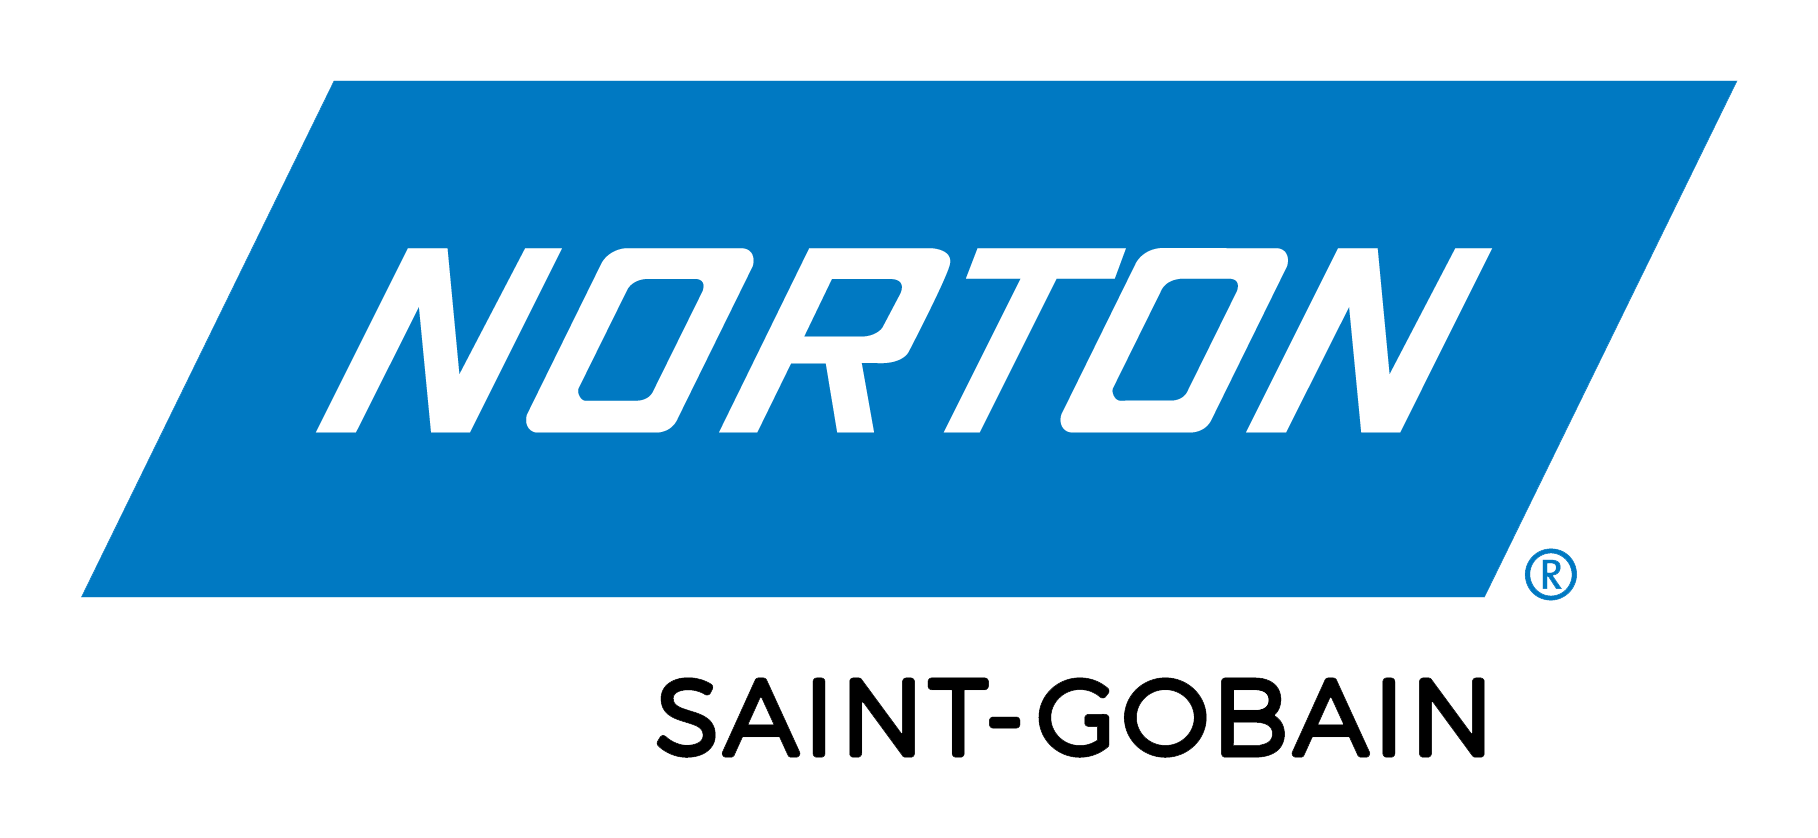 SG_Norton_logo_rgb_26